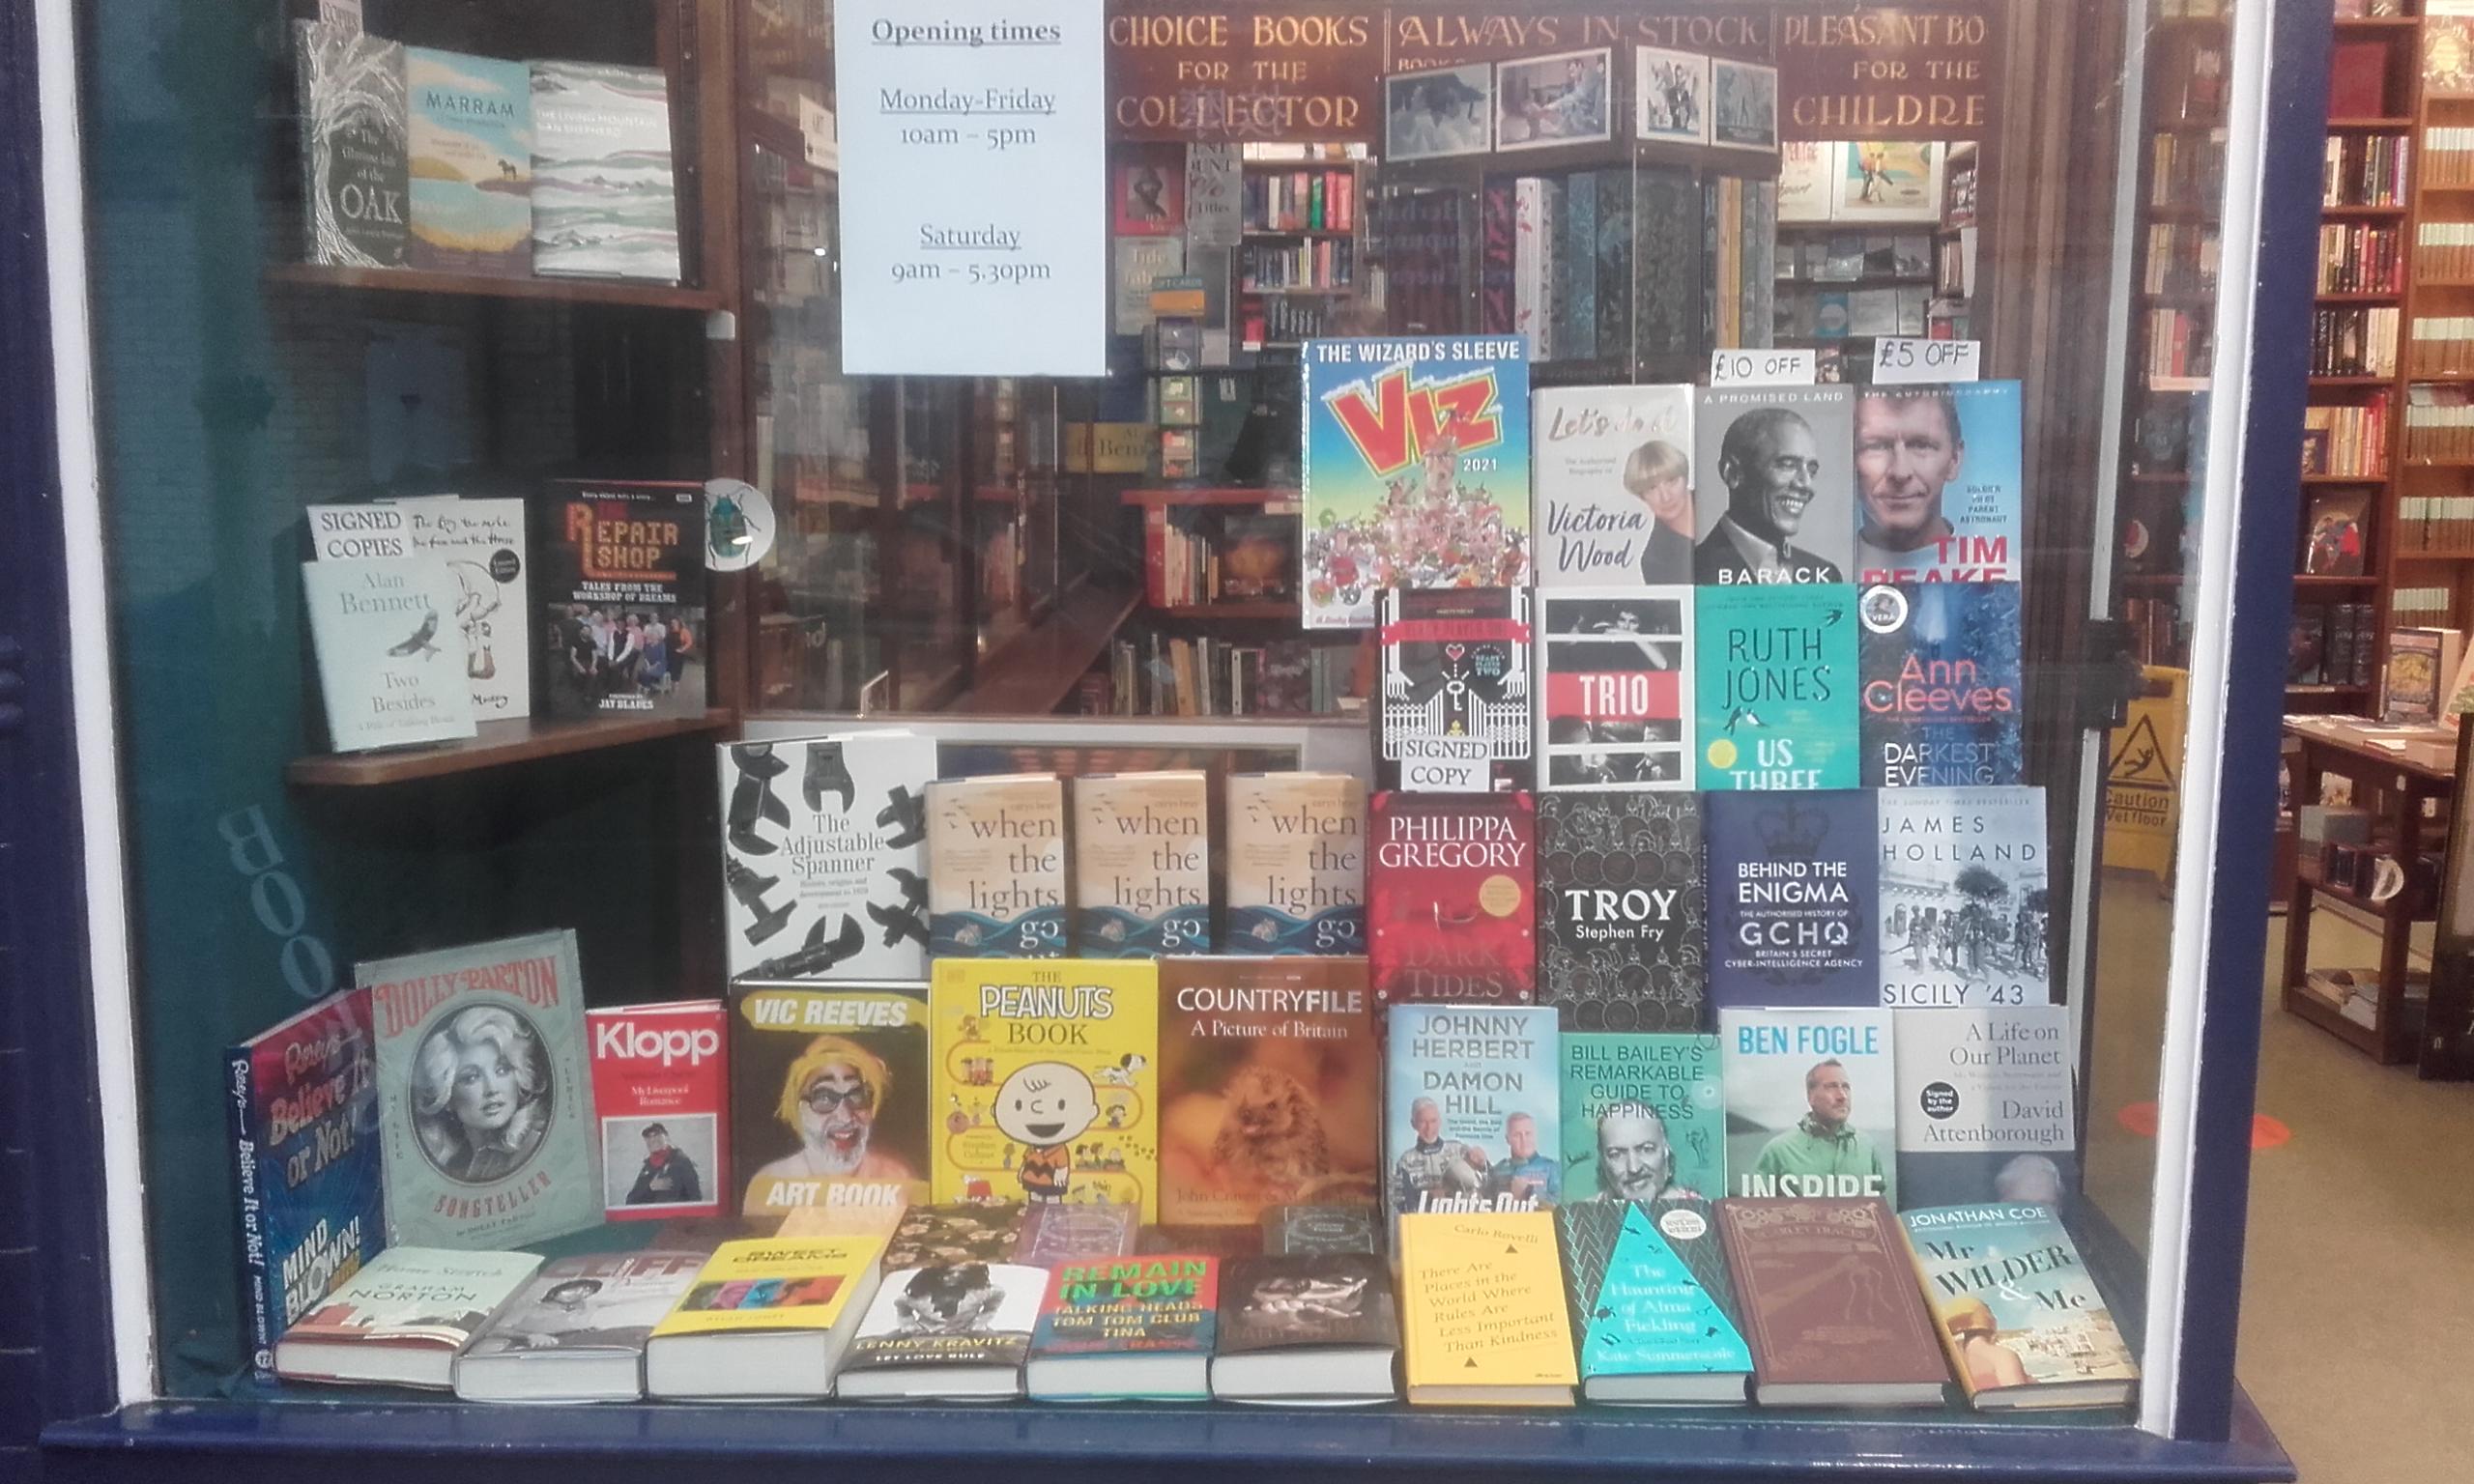 Broadhurst's bookshop in Southport